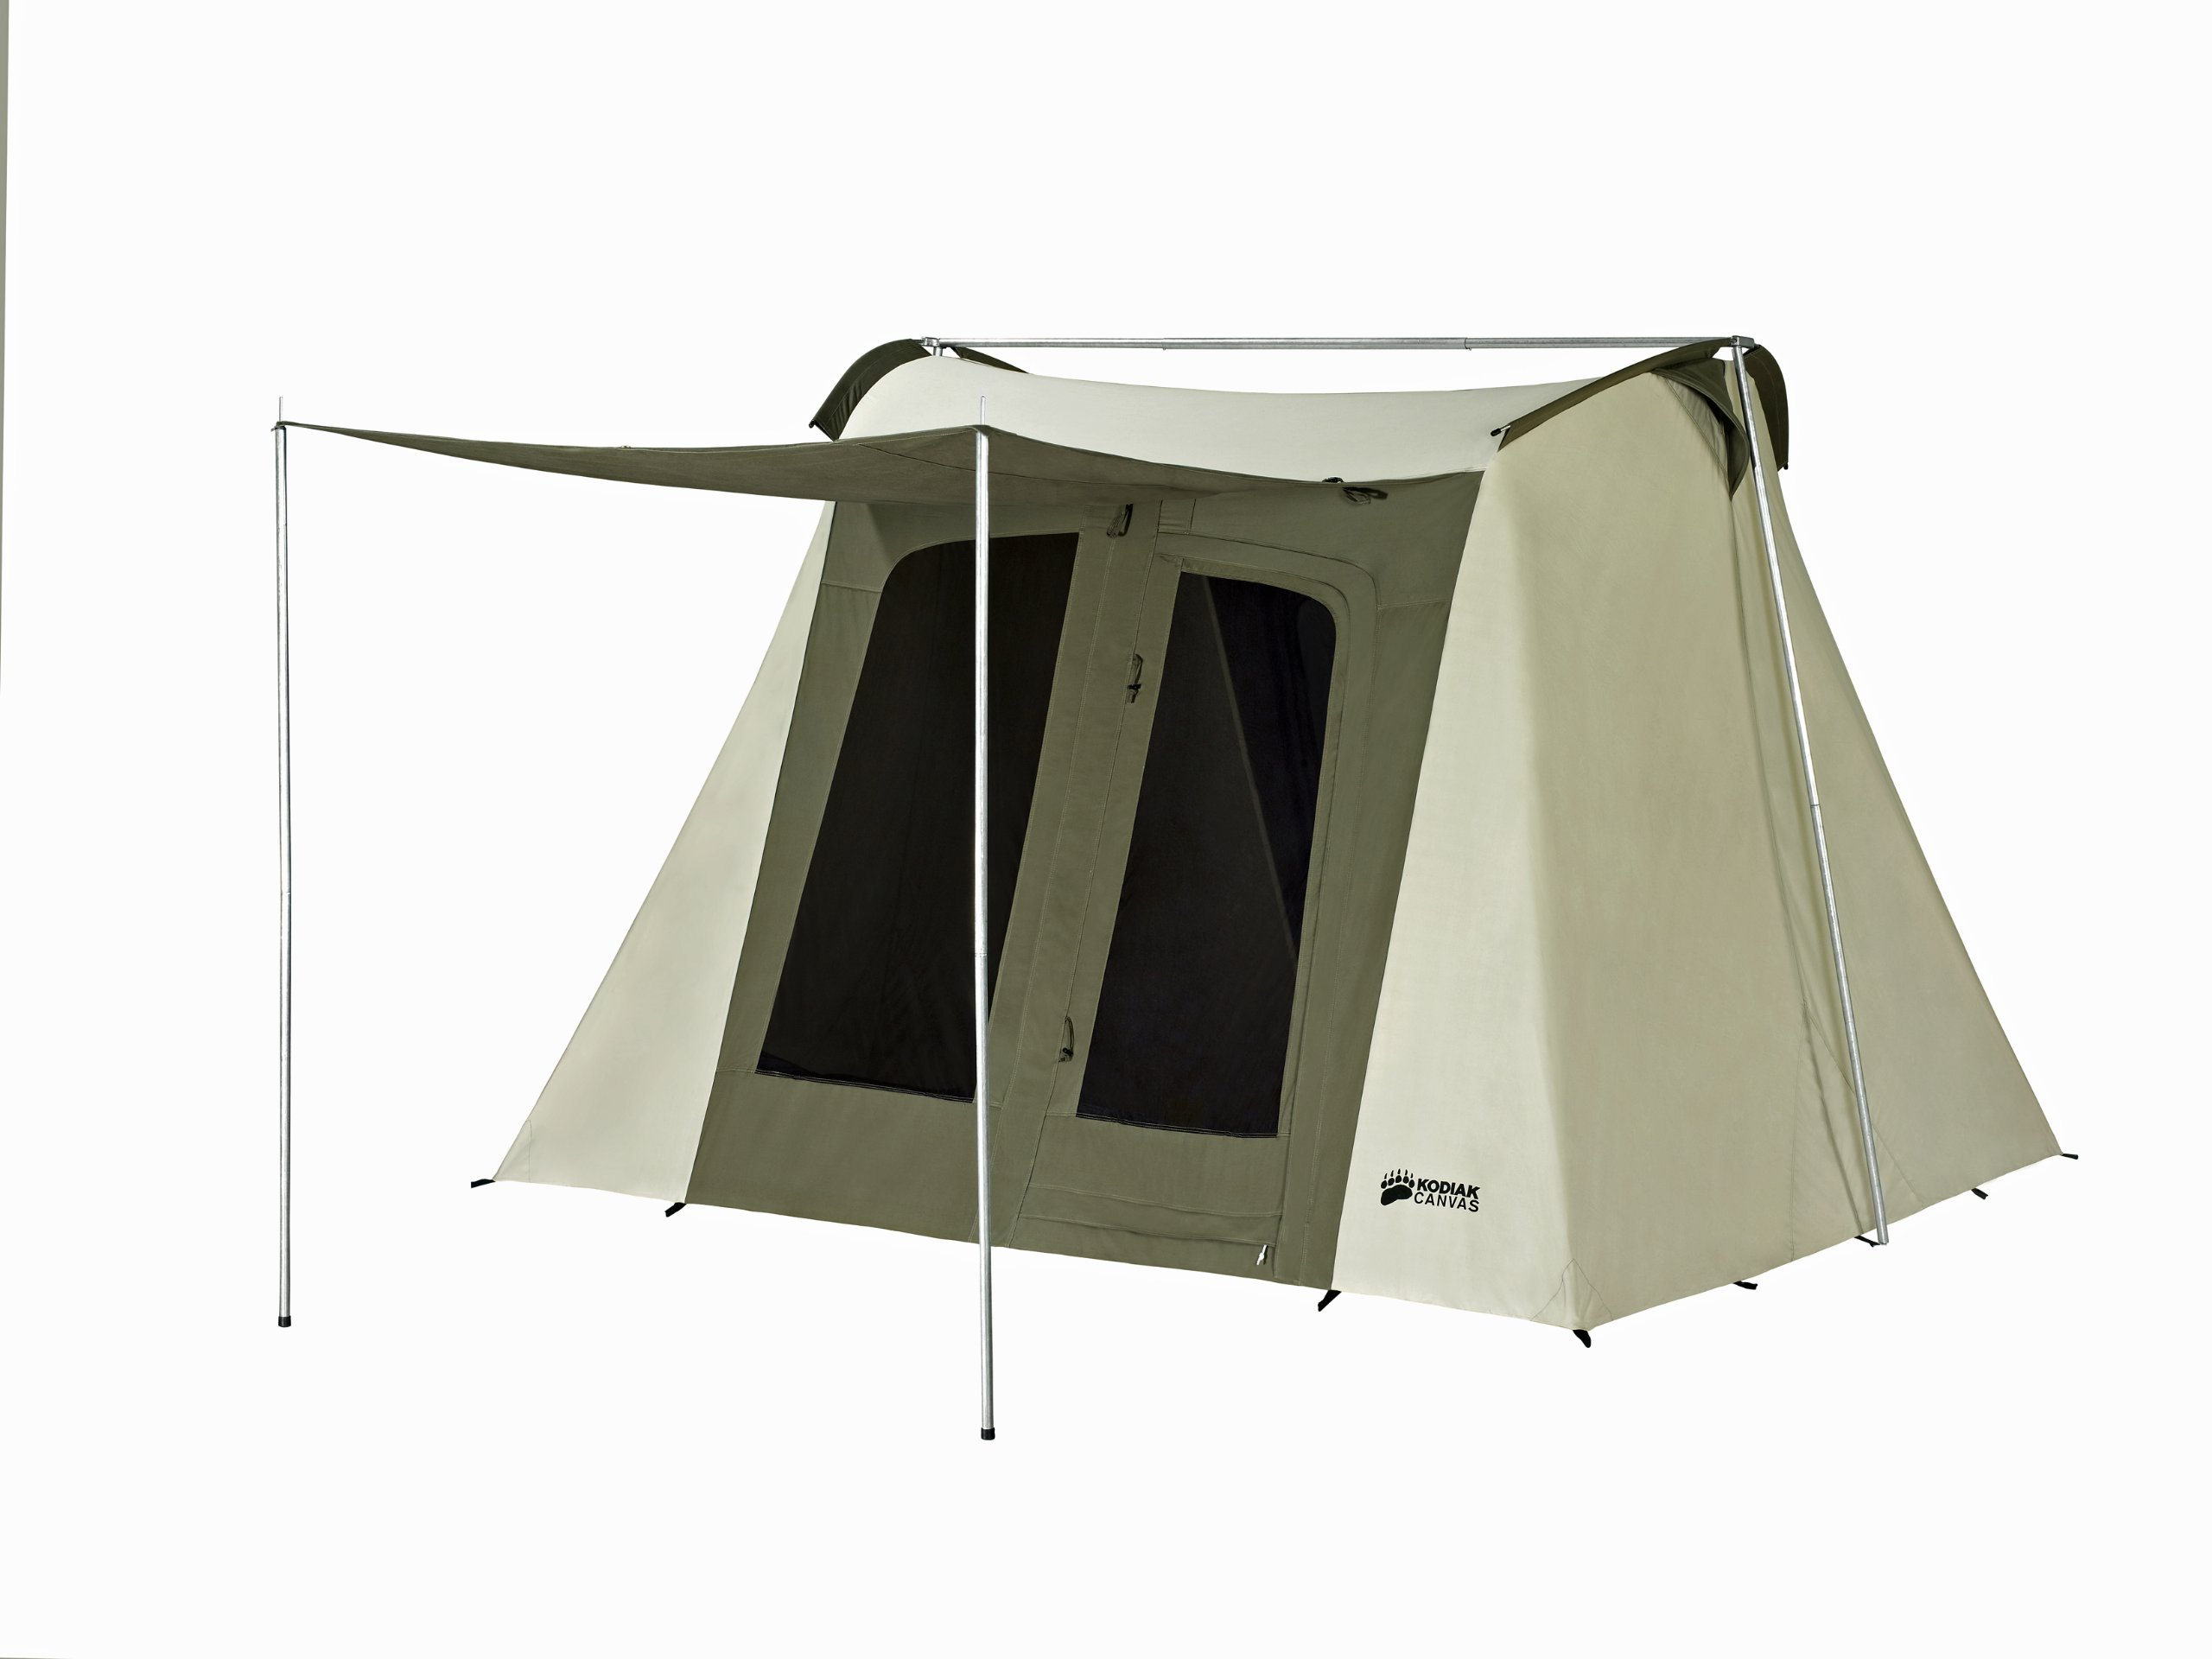 Kodiak Canvas Flex-Bow 6-Person Canvas Tent, Deluxe by Kodiak Canvas (Image #1)